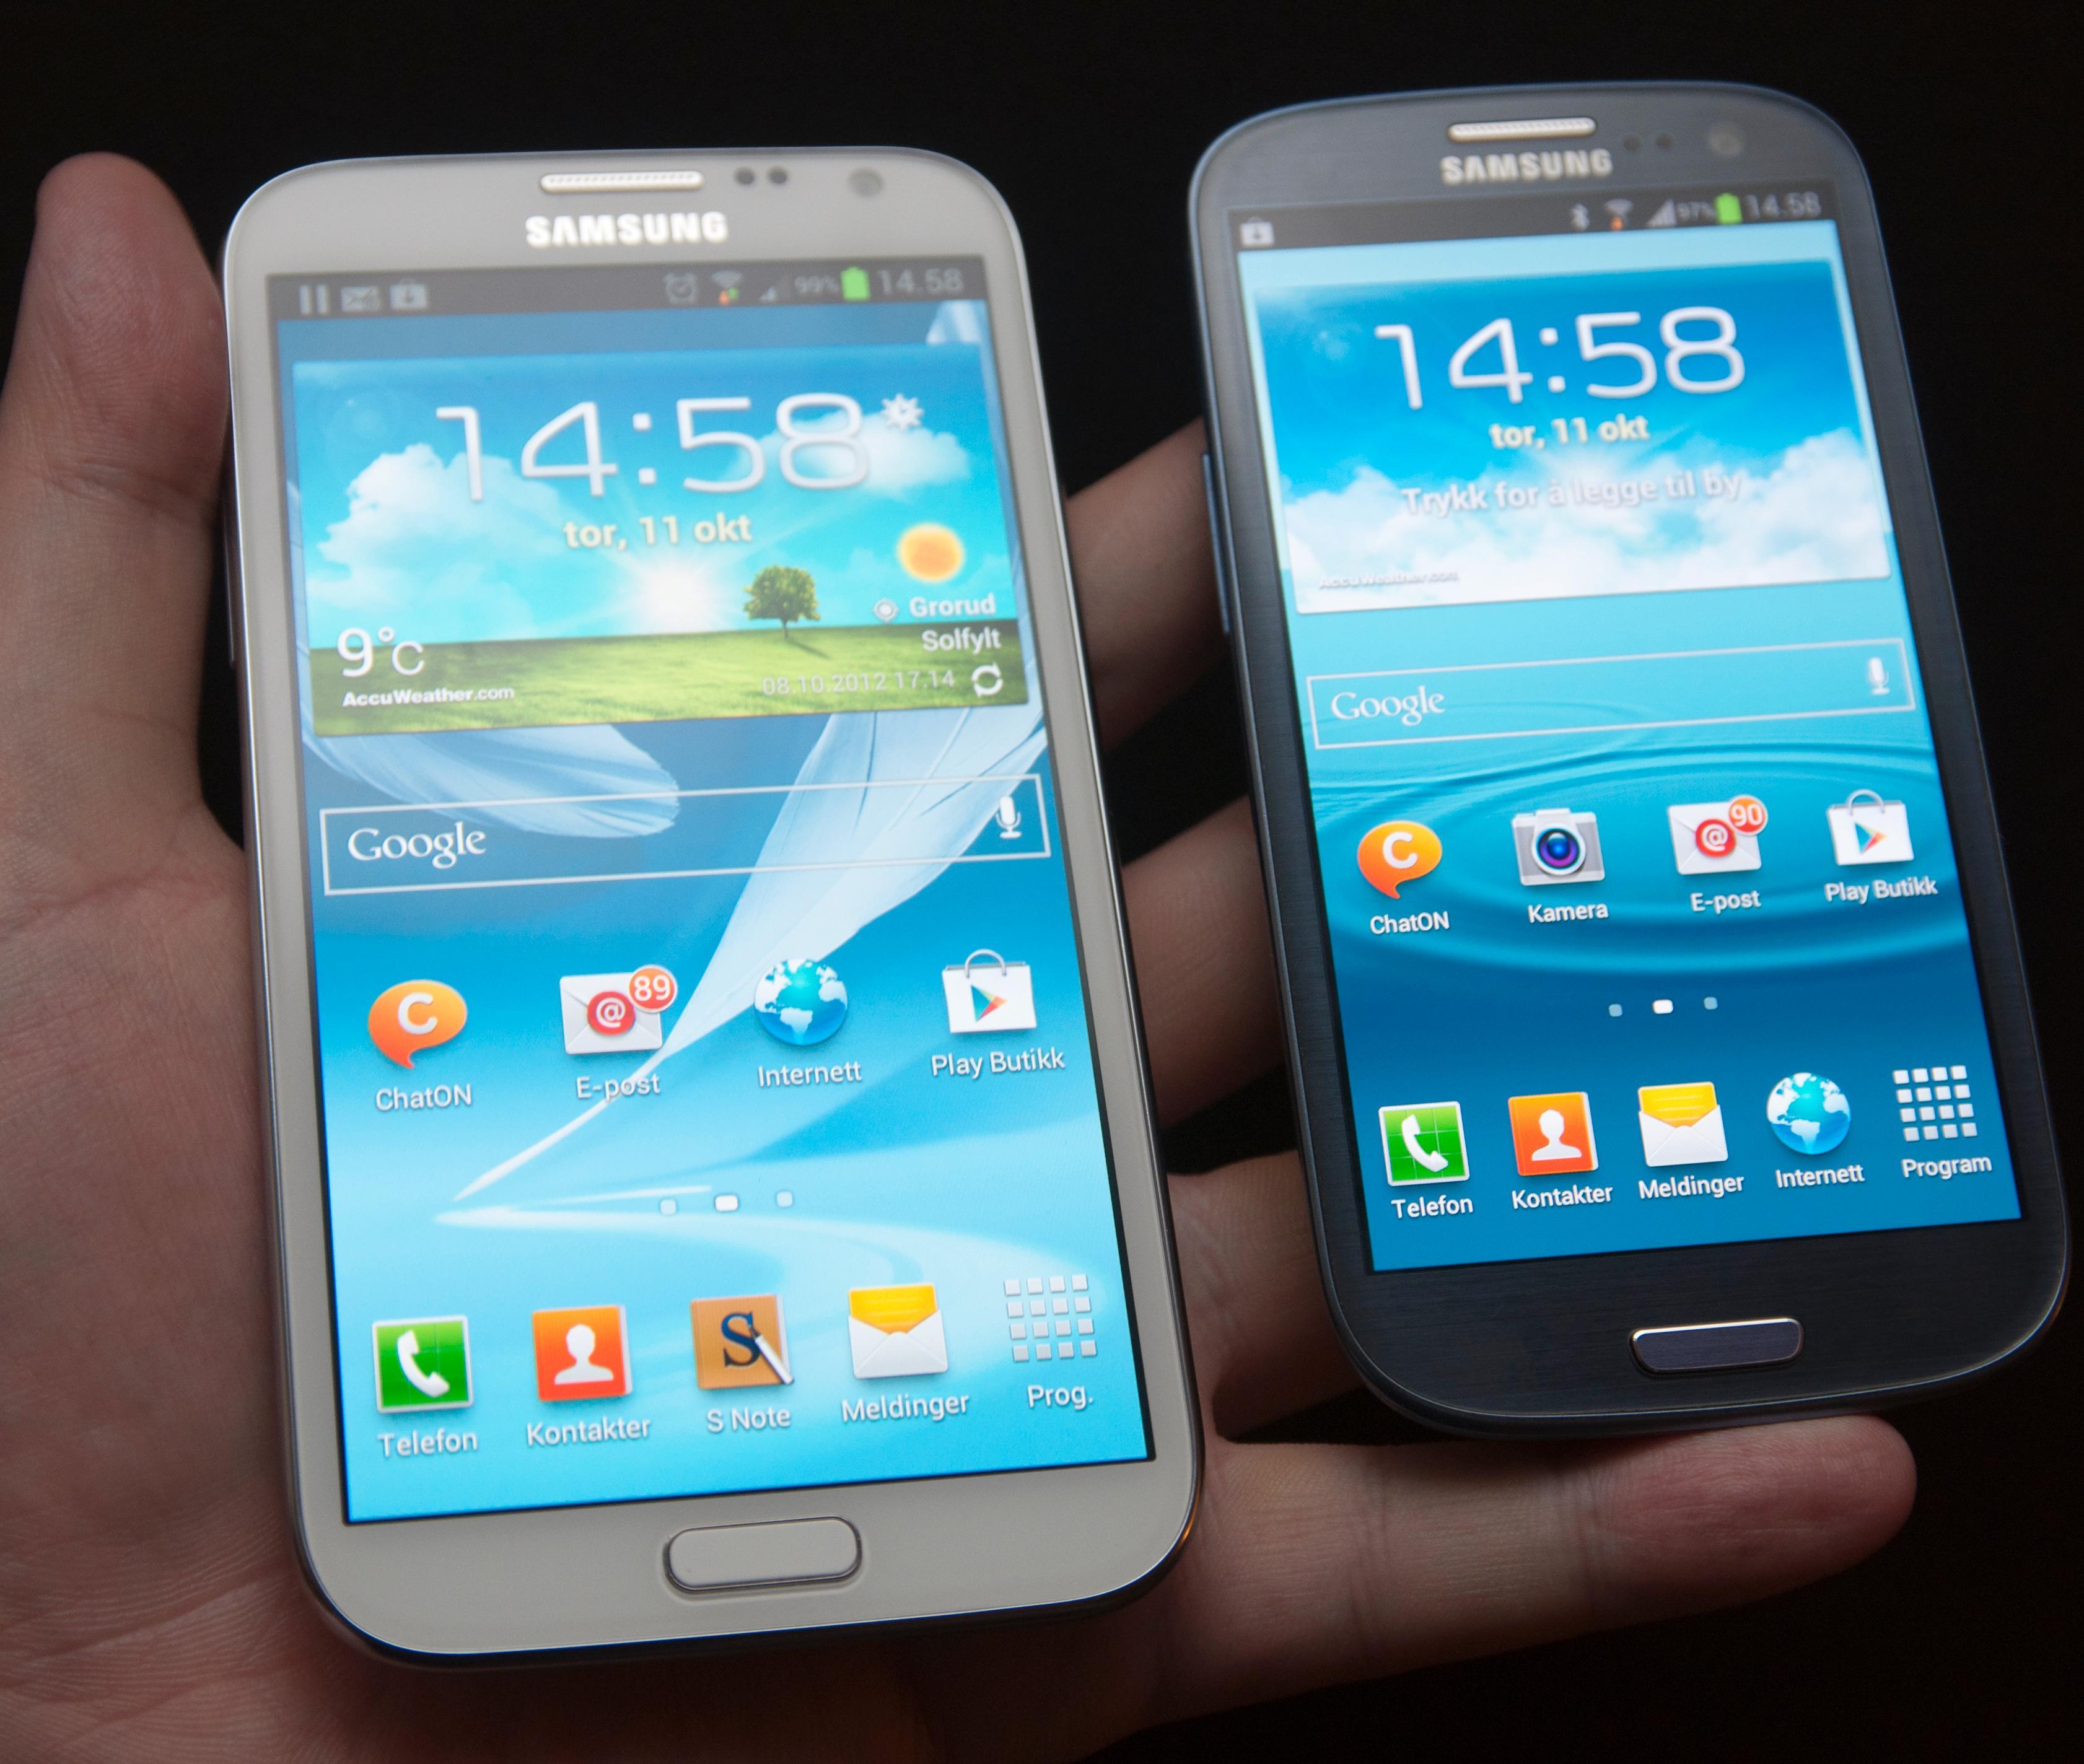 Galaxy Note II har samme designspråk som Samsungs andre toppmodell; Galaxy S III.Foto: Finn Jarle Kvalheim, Amobil.no